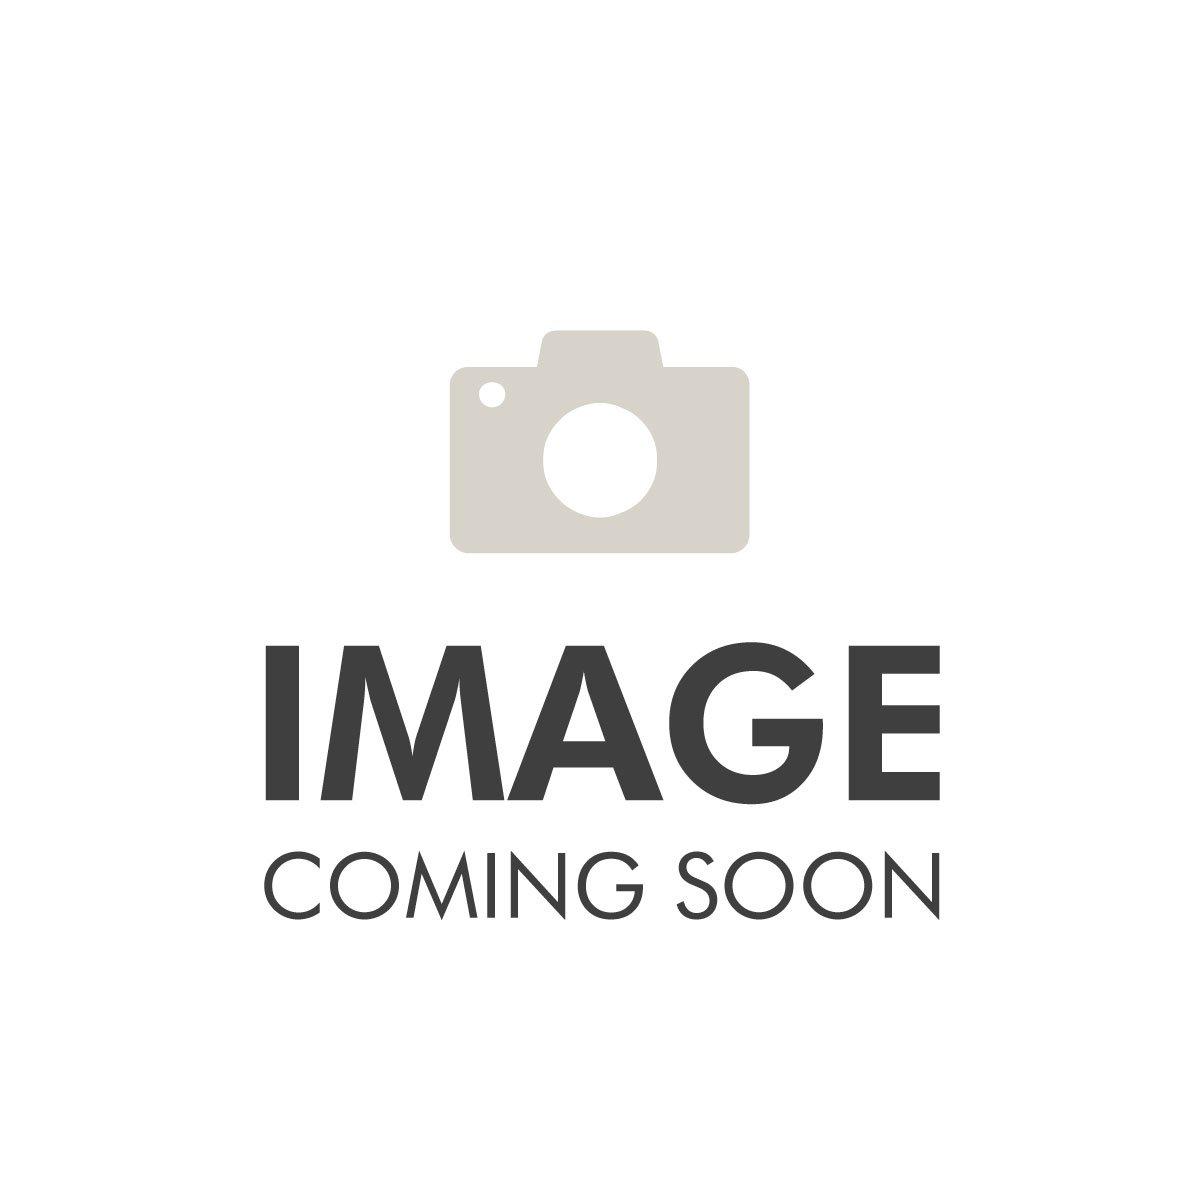 Uhlmann - Dry Foil/Sabre Pad - Felt